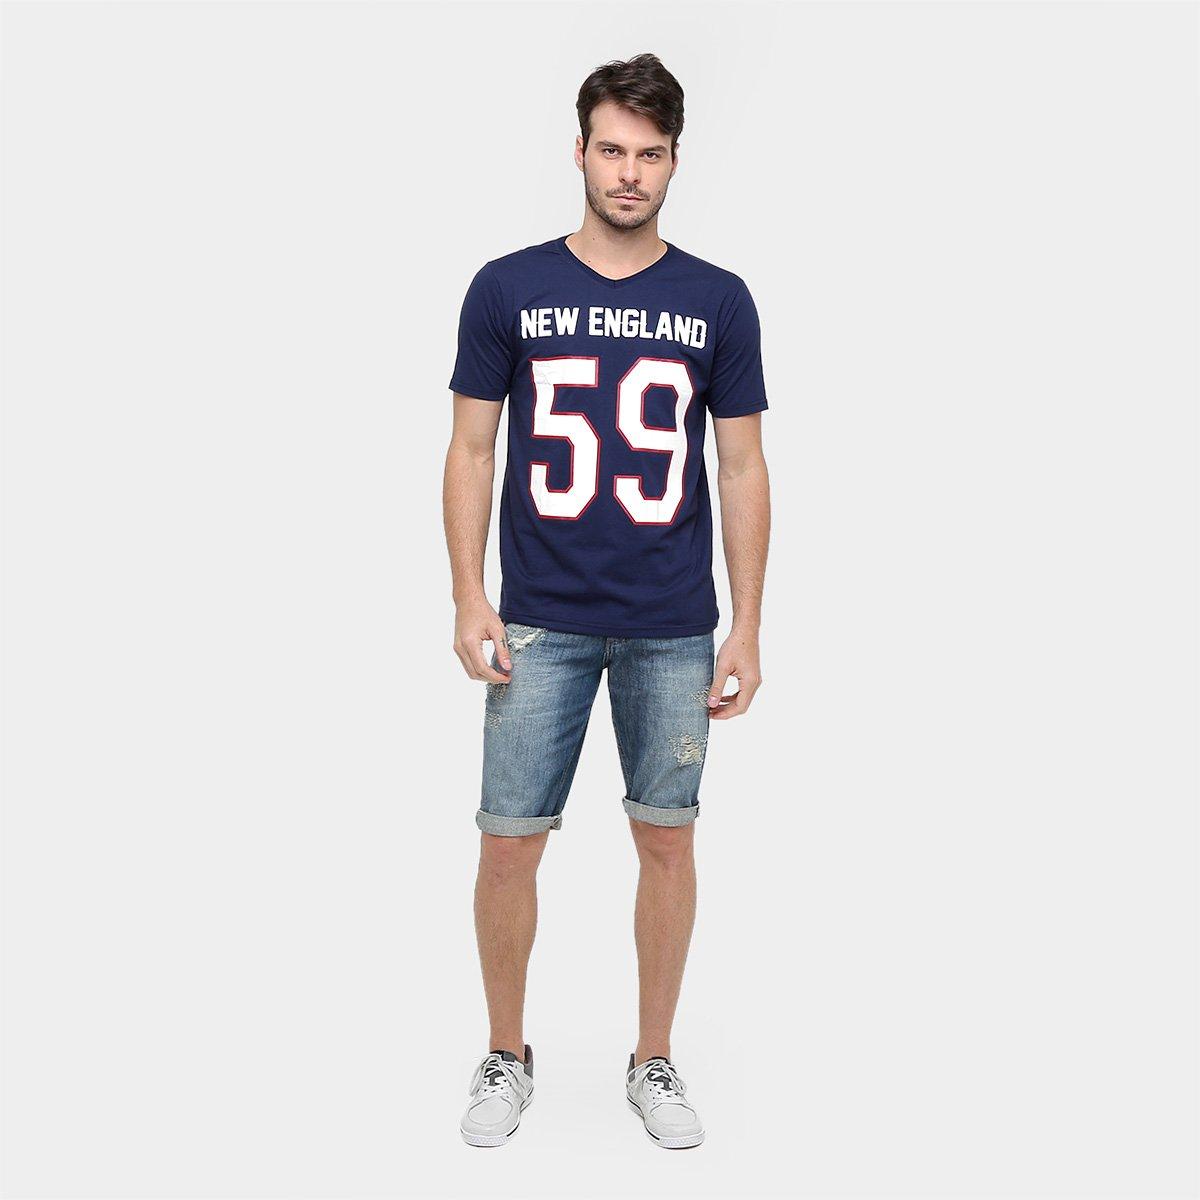 ... Camisa Futebol Americano New England Gonew Leagues Masculina ... cd9b1db4efcfb